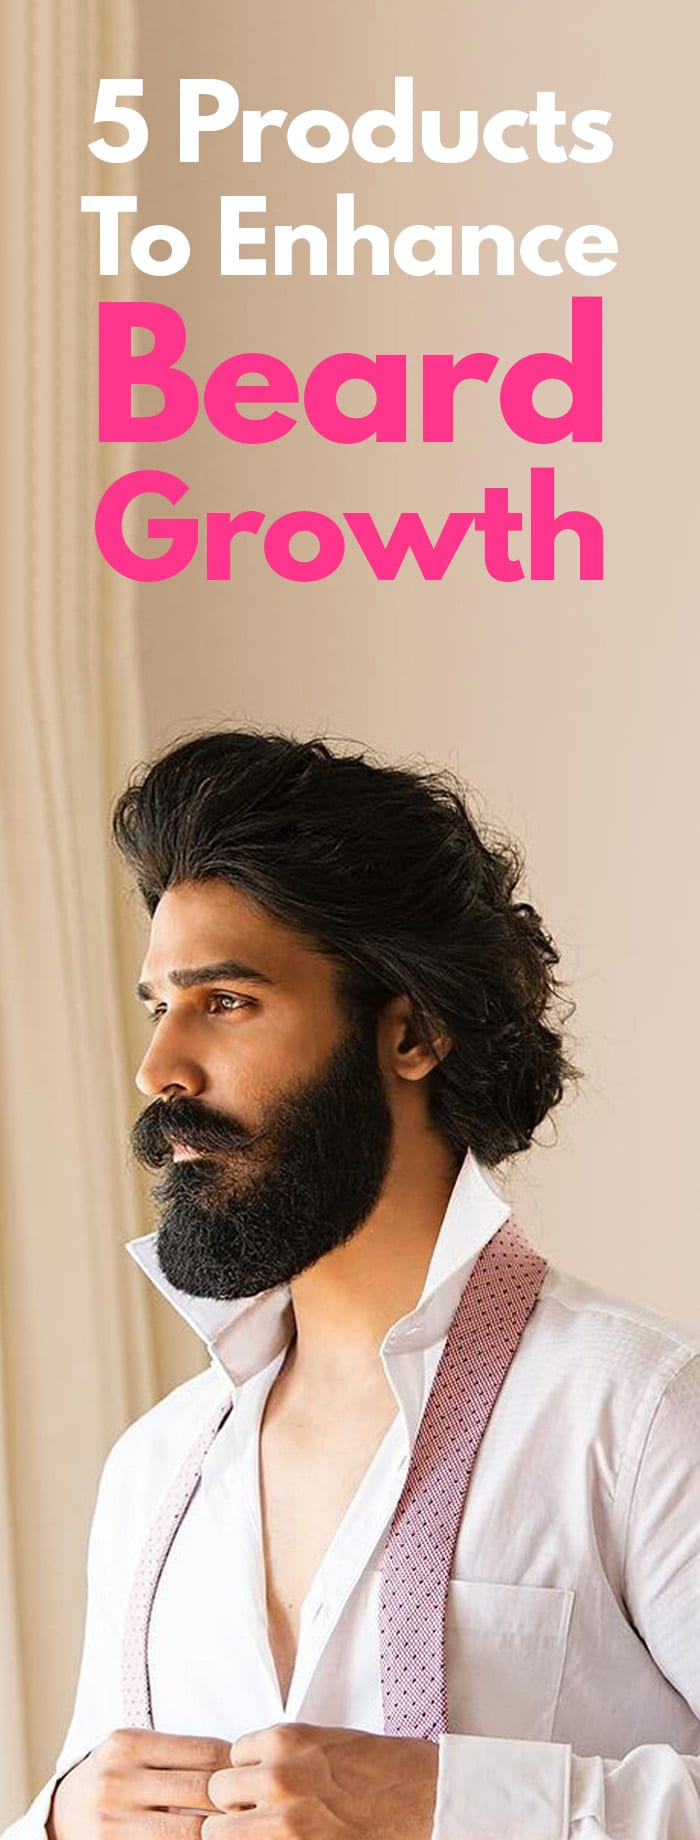 Beard Growth For Men